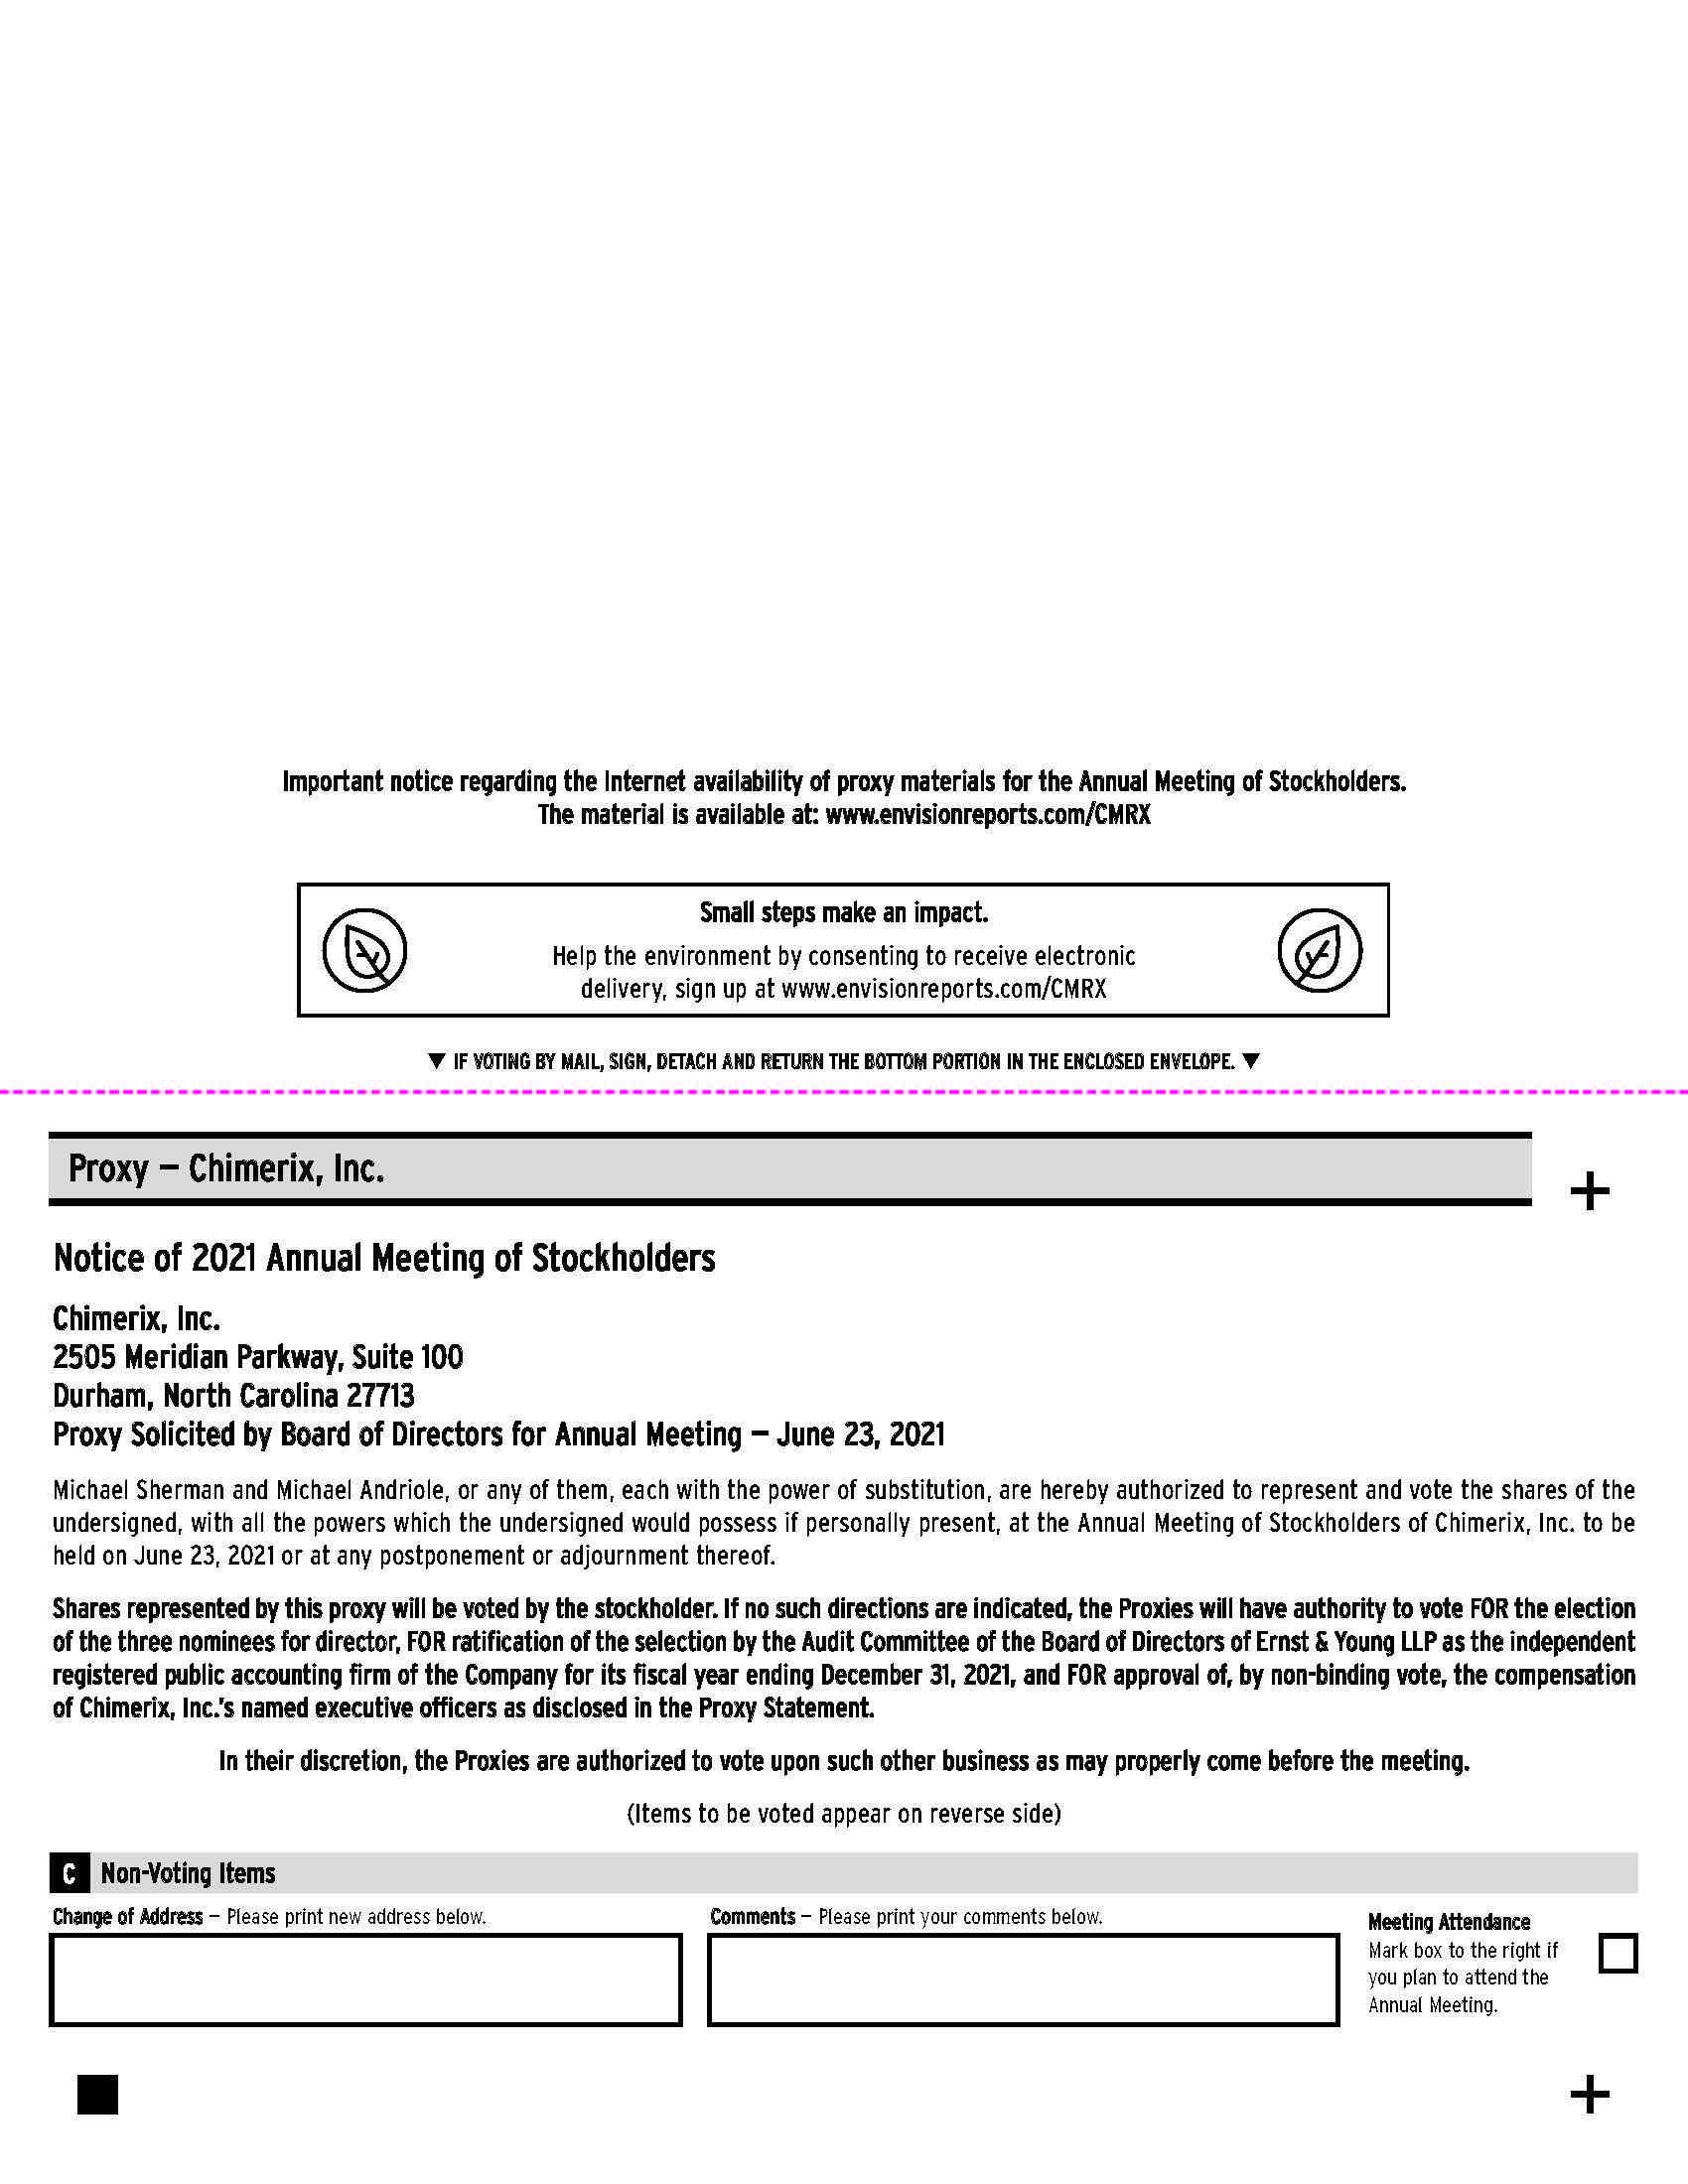 https://cdn.kscope.io/24cc06ed7ff94748c6aef2a884744cd9-proxycard-page_21a.jpg